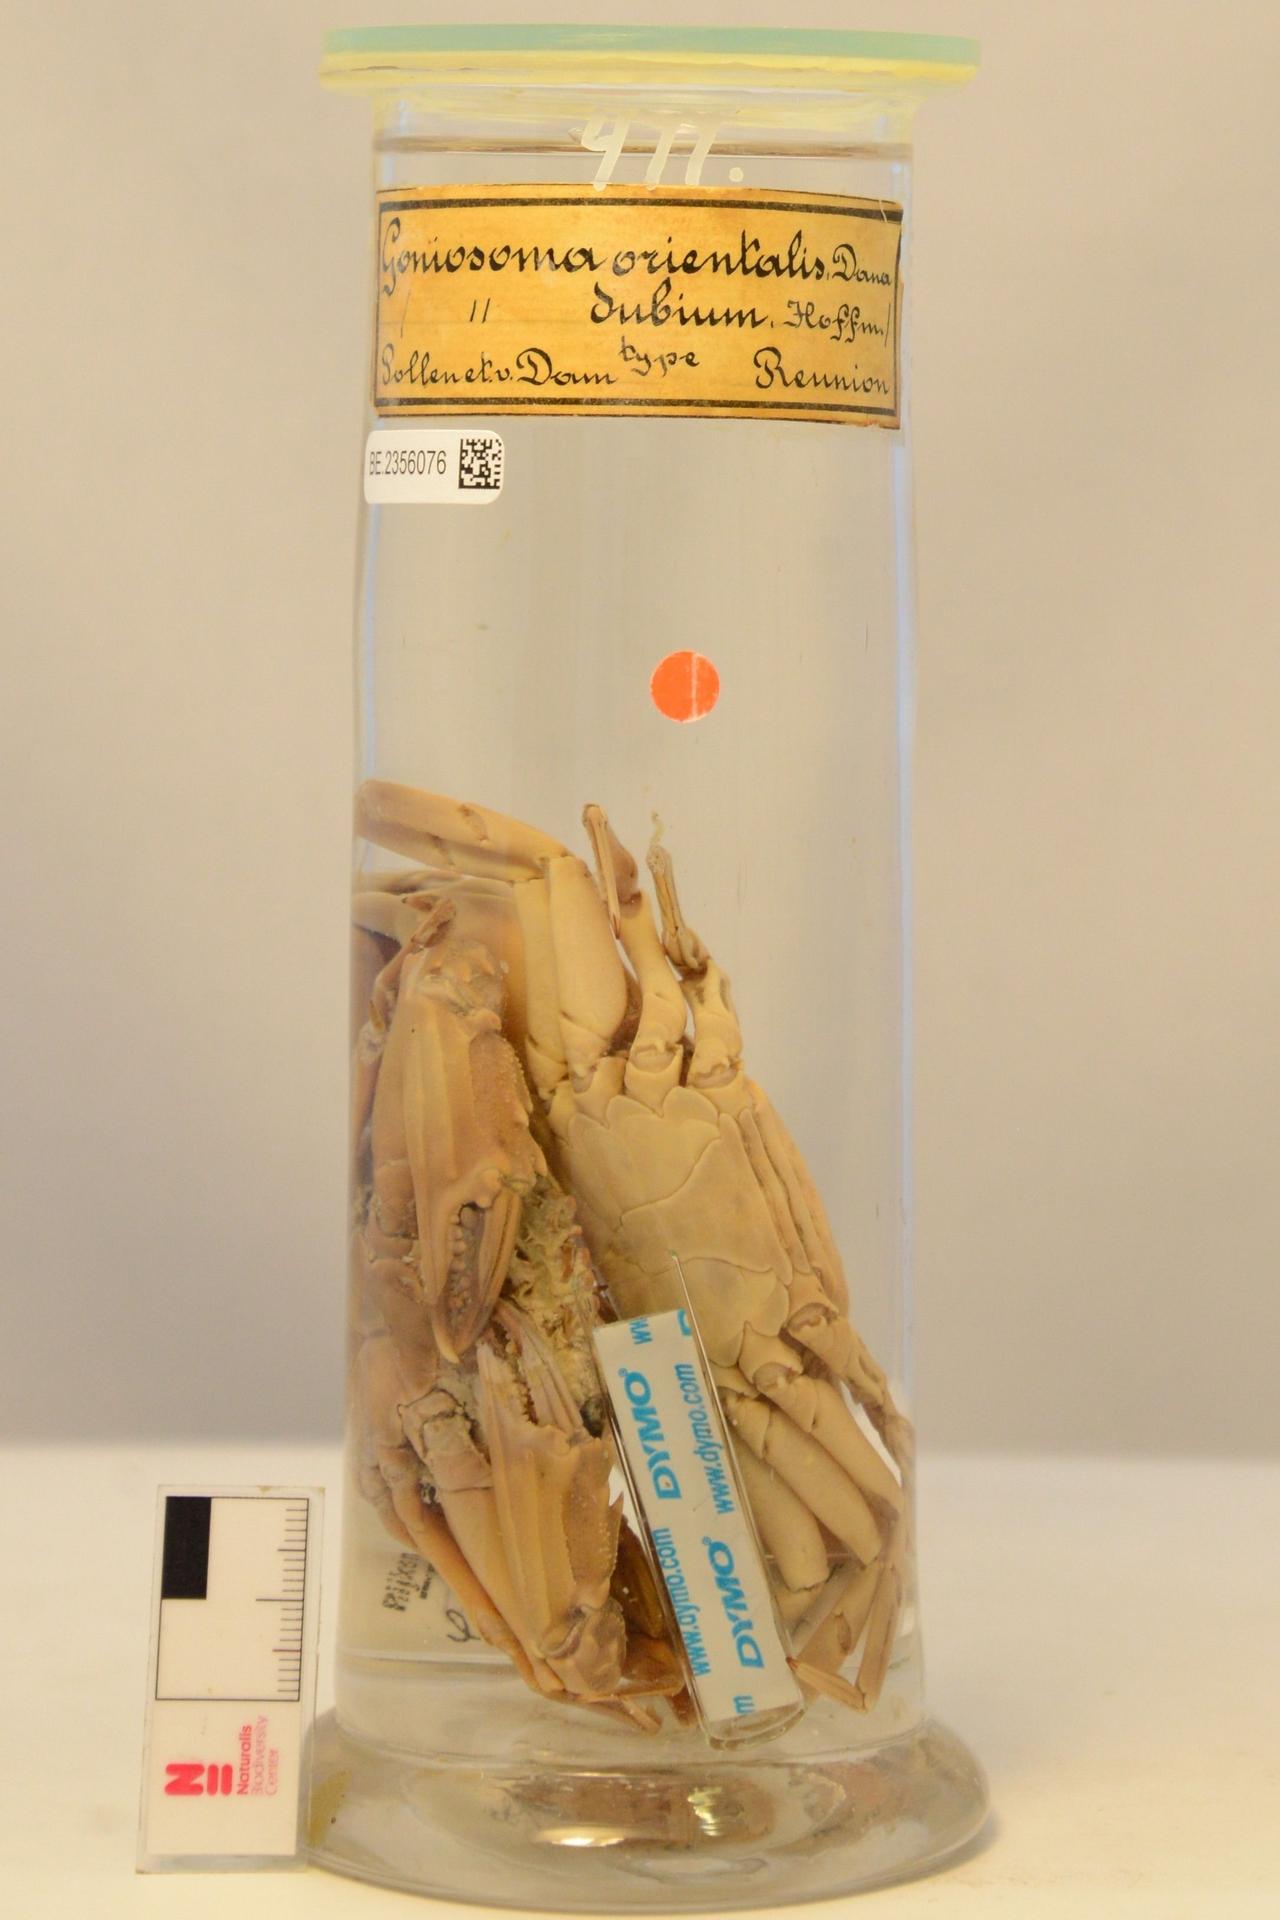 RMNH.CRUS.D.477   Charybdis (Charybdis) orientalis Dana, 1852